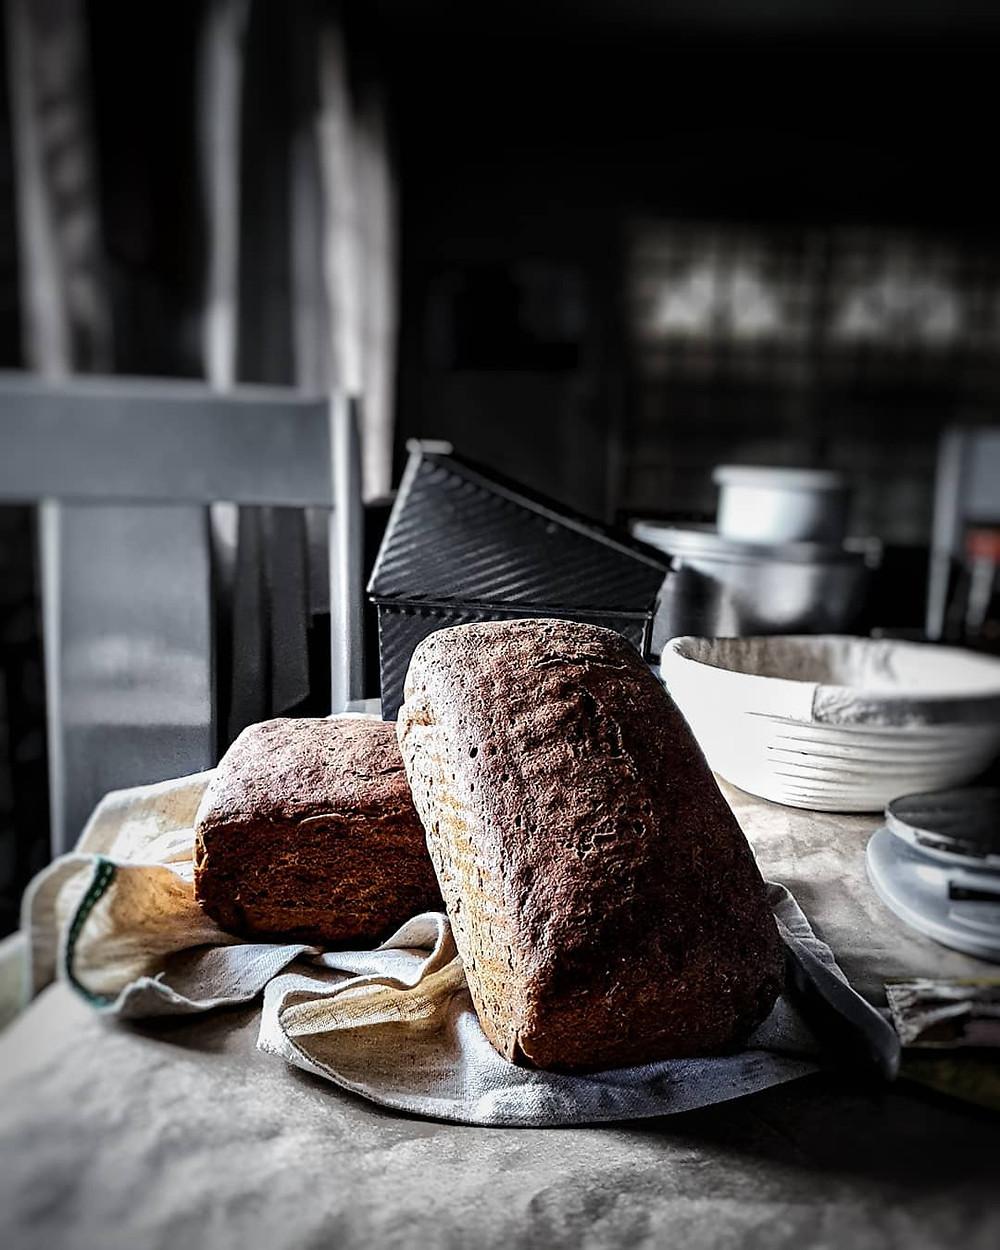 Bread made with buckwheat flour